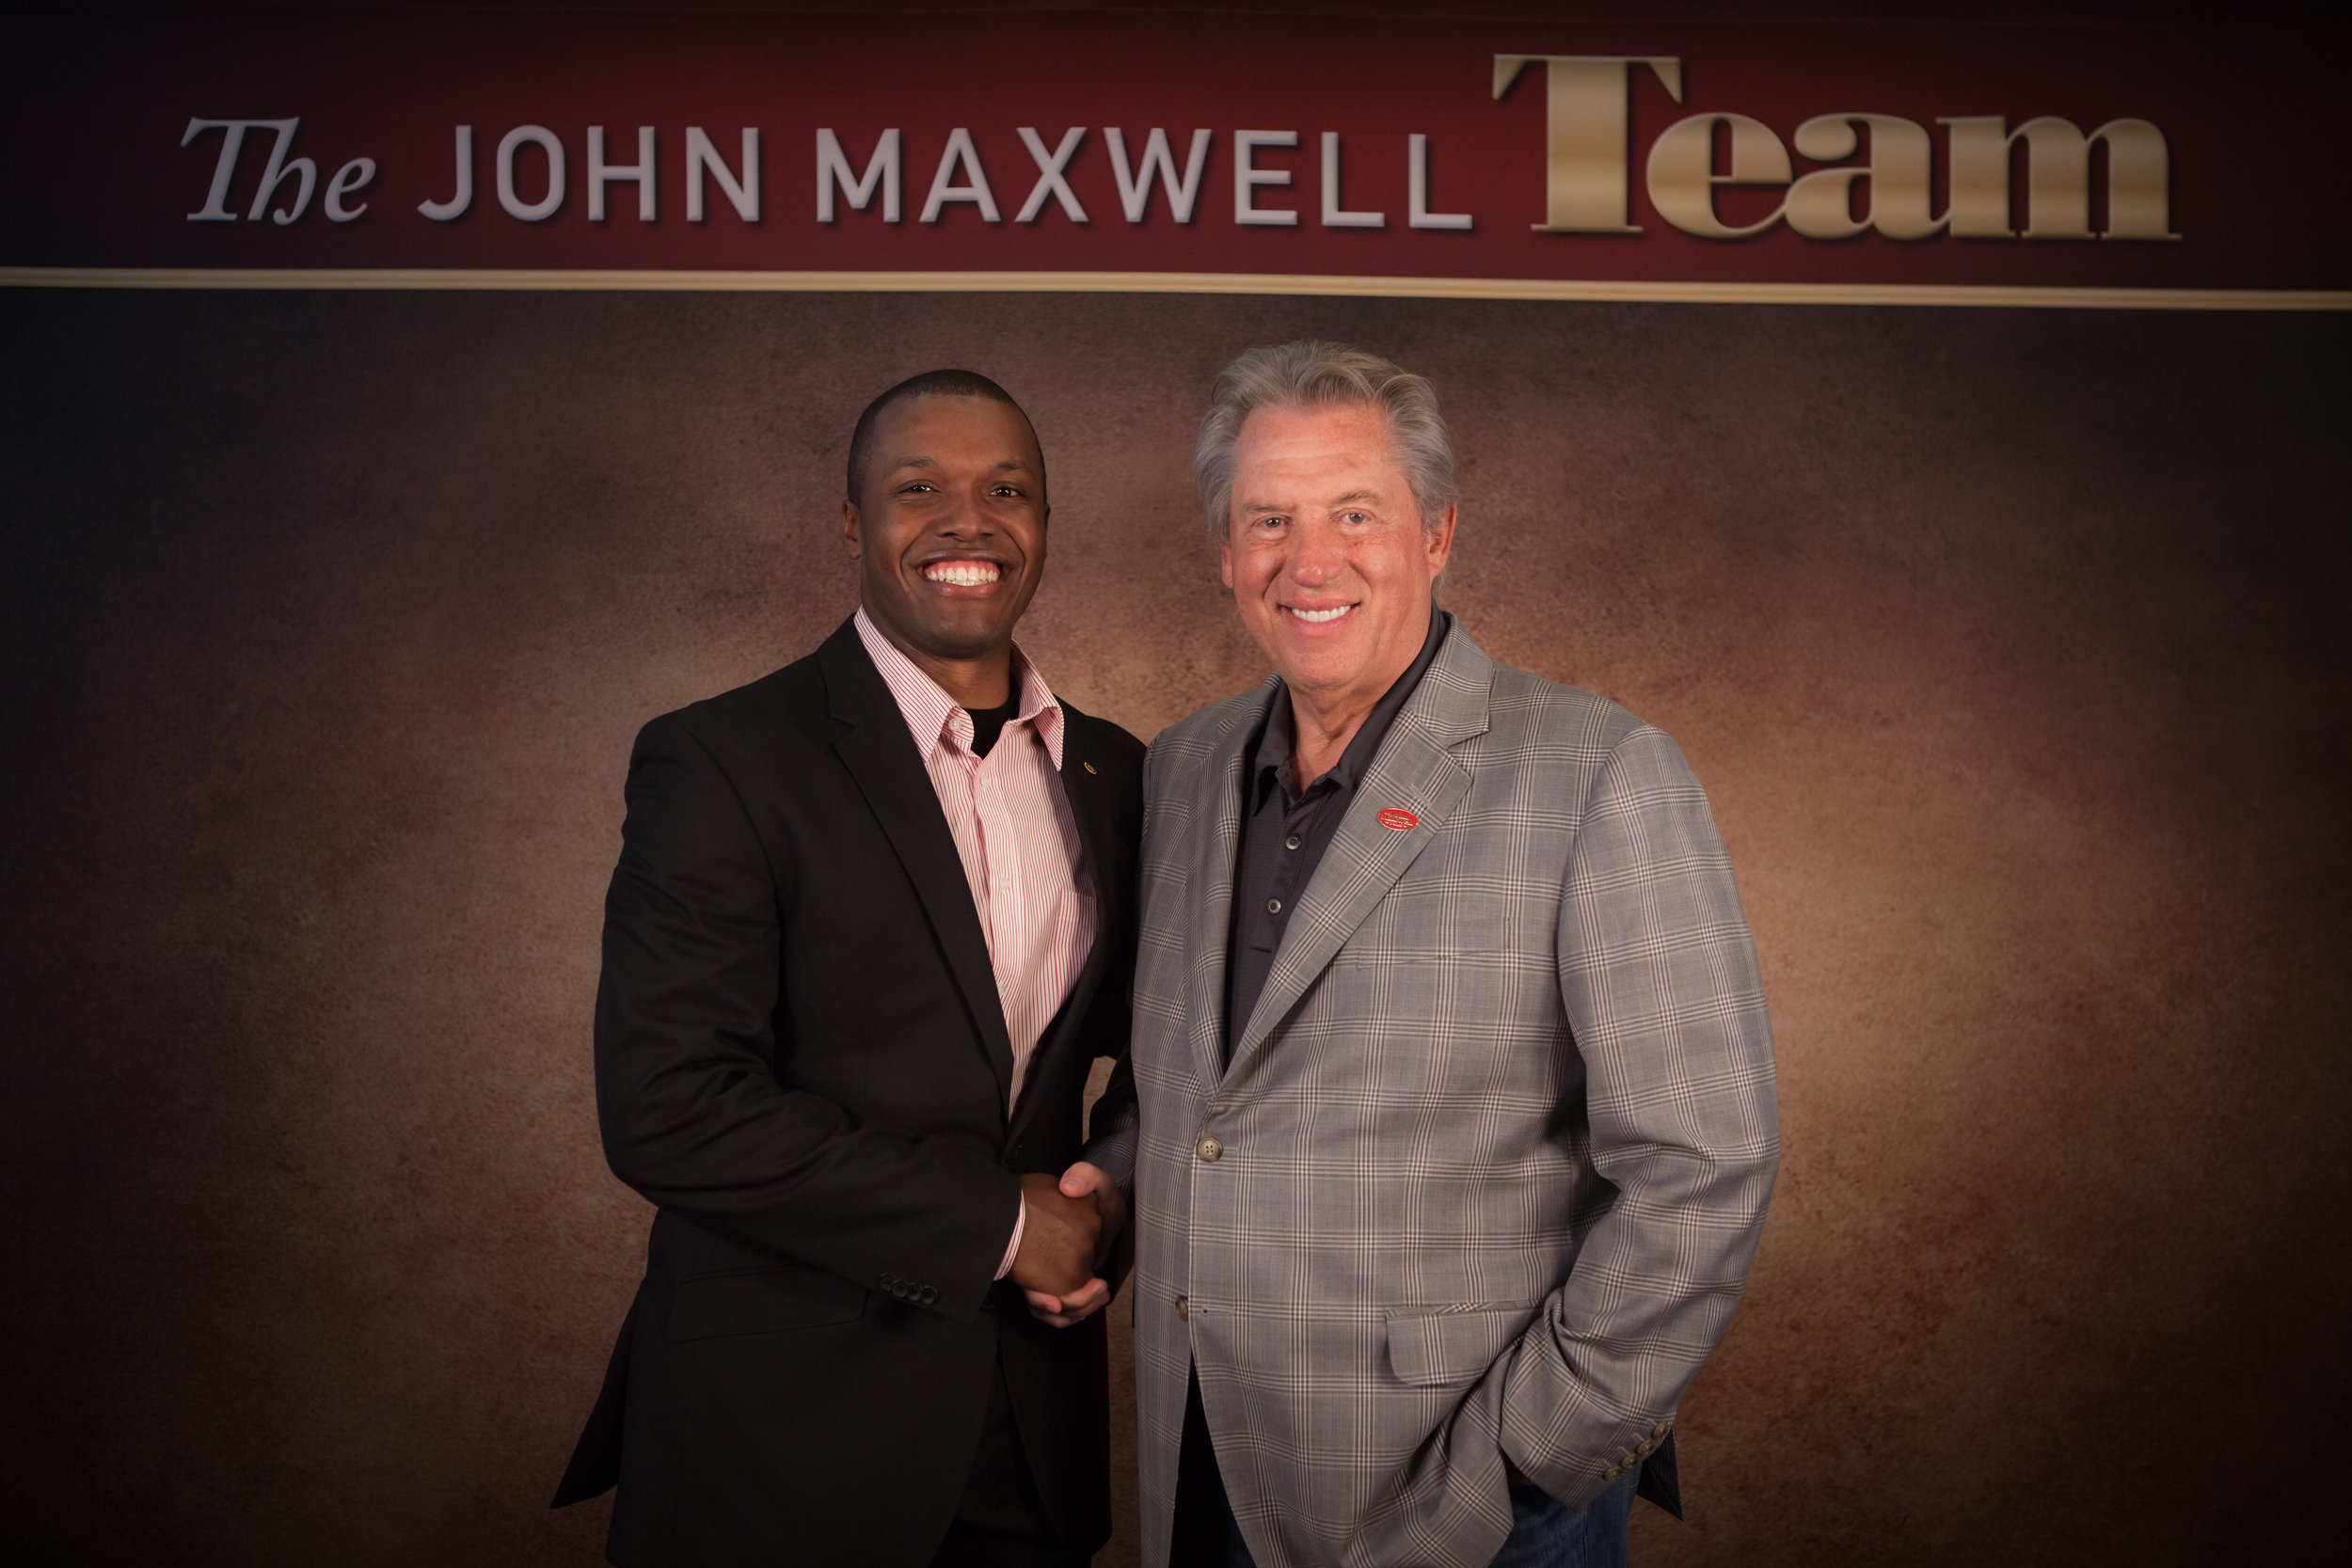 Bryant Hall, Sr. & John Maxwell